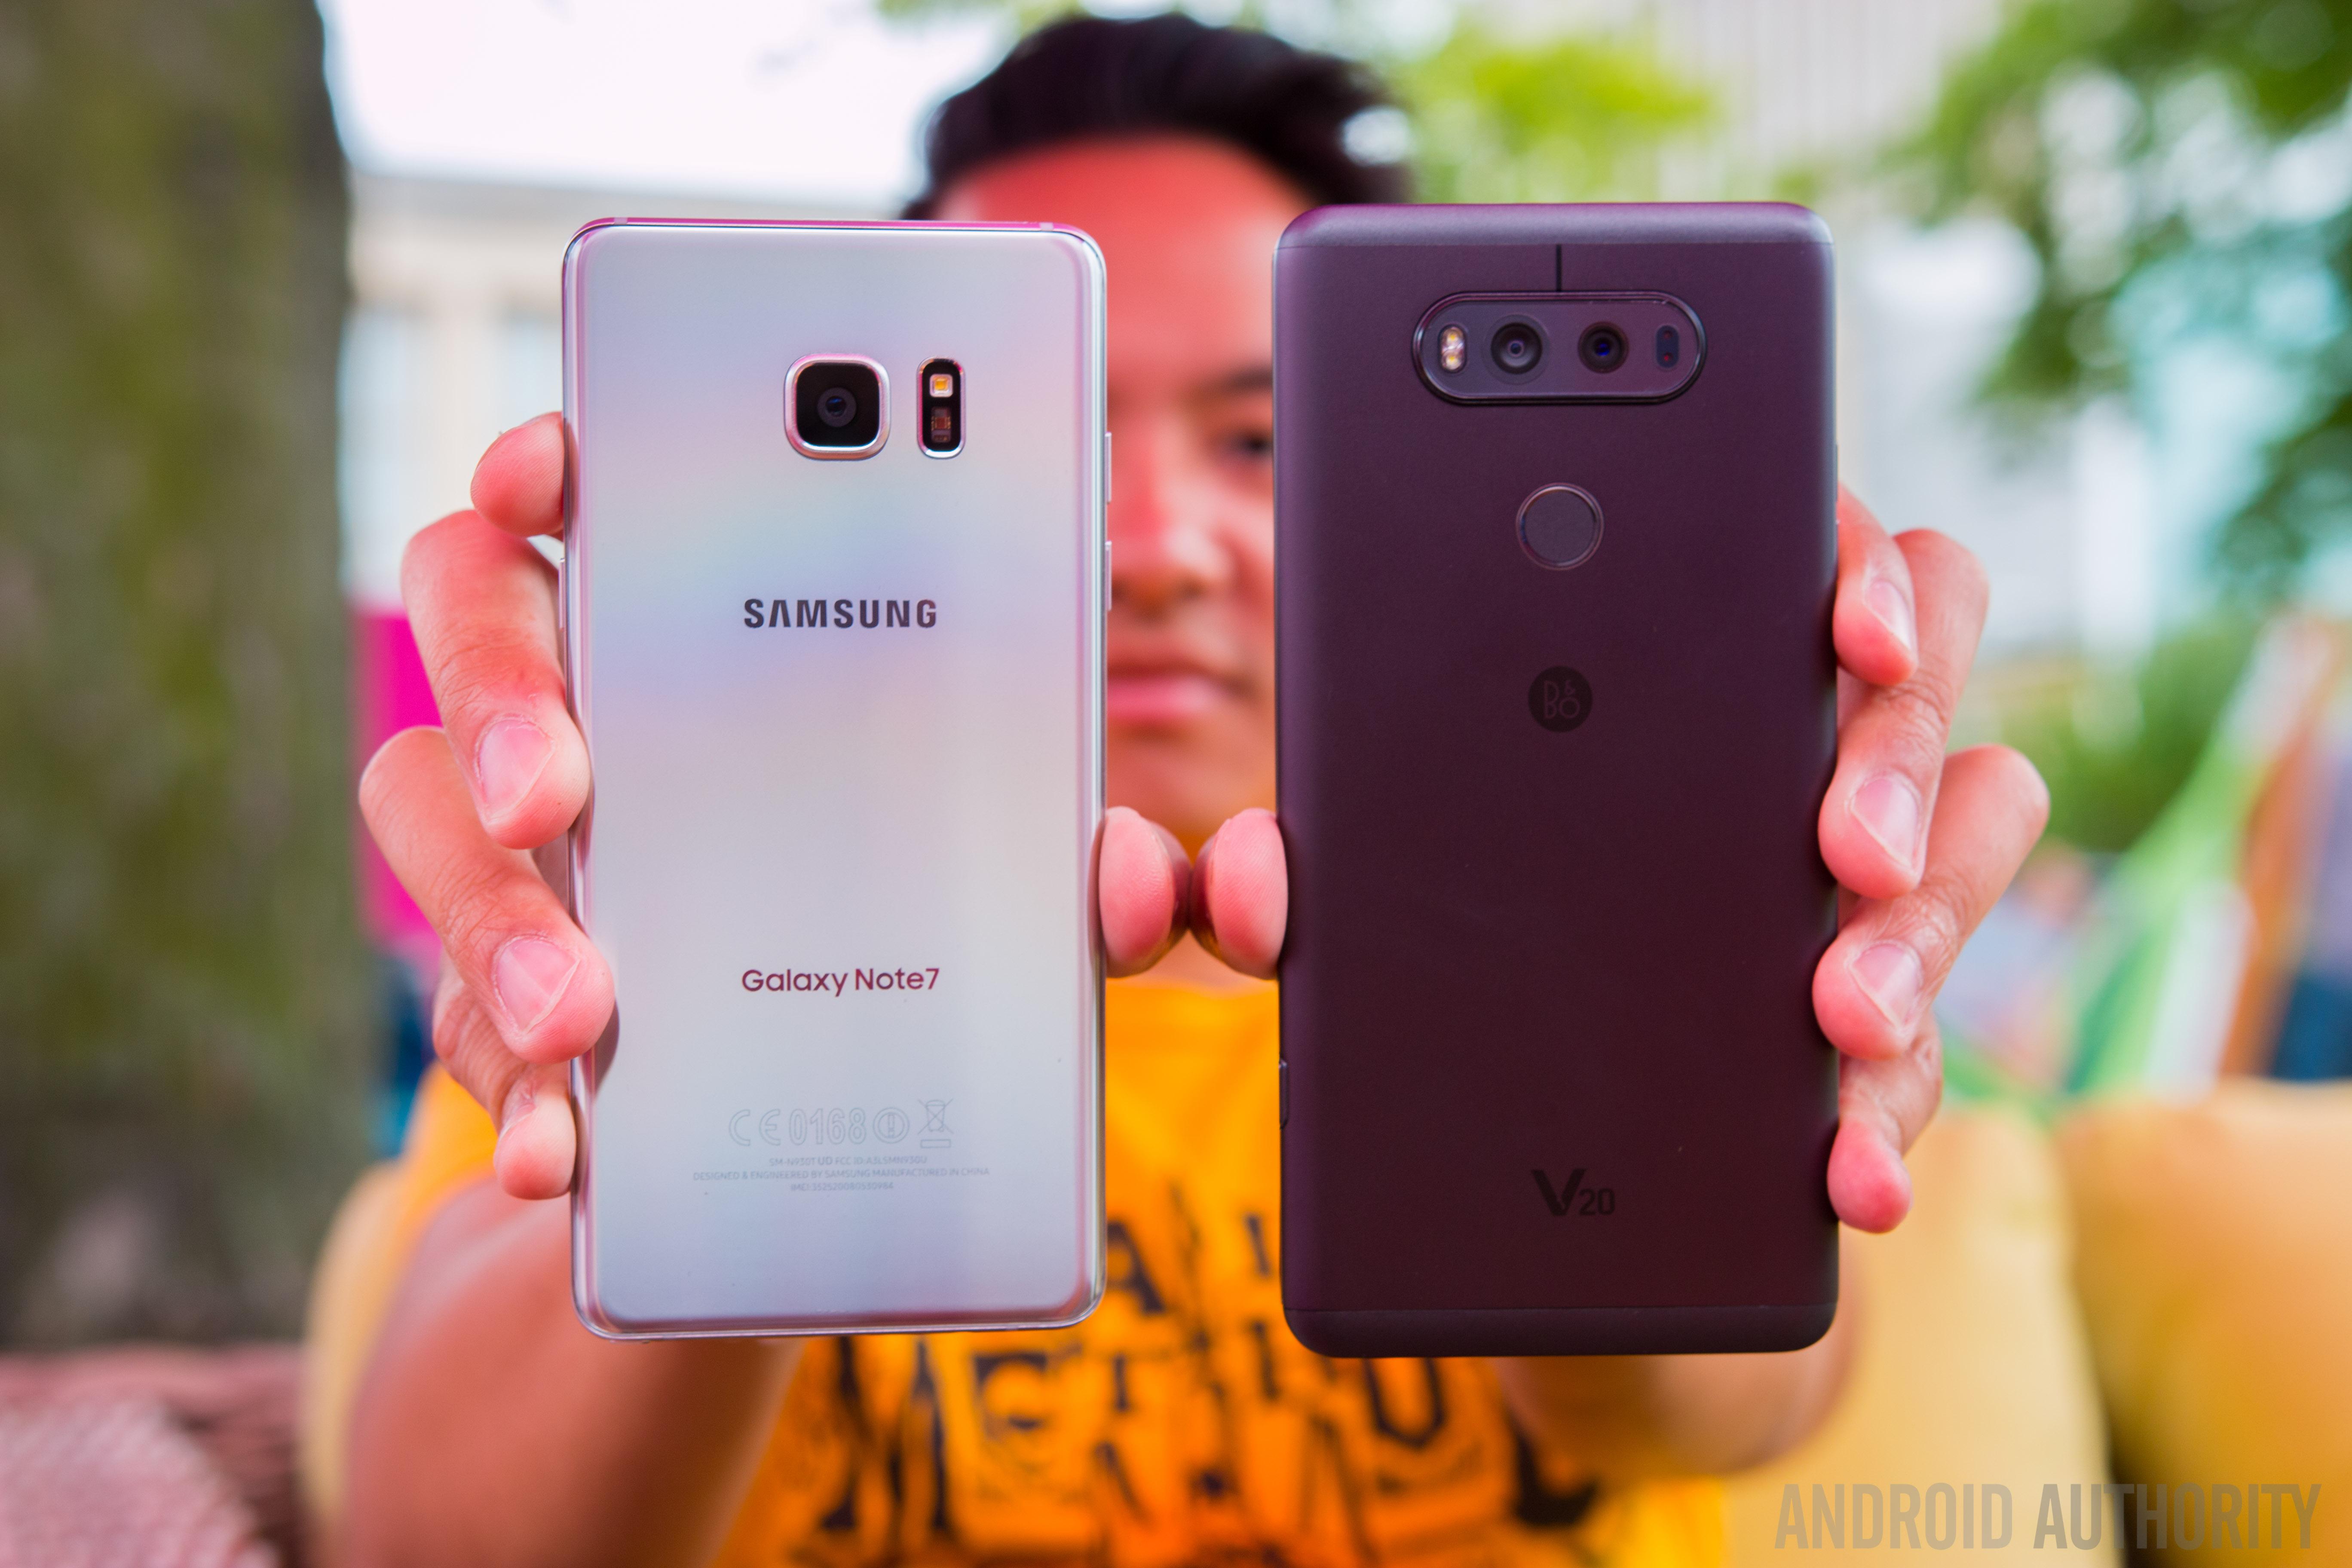 LG V20 vs Samsung Galaxy Note7 Quick Look-10